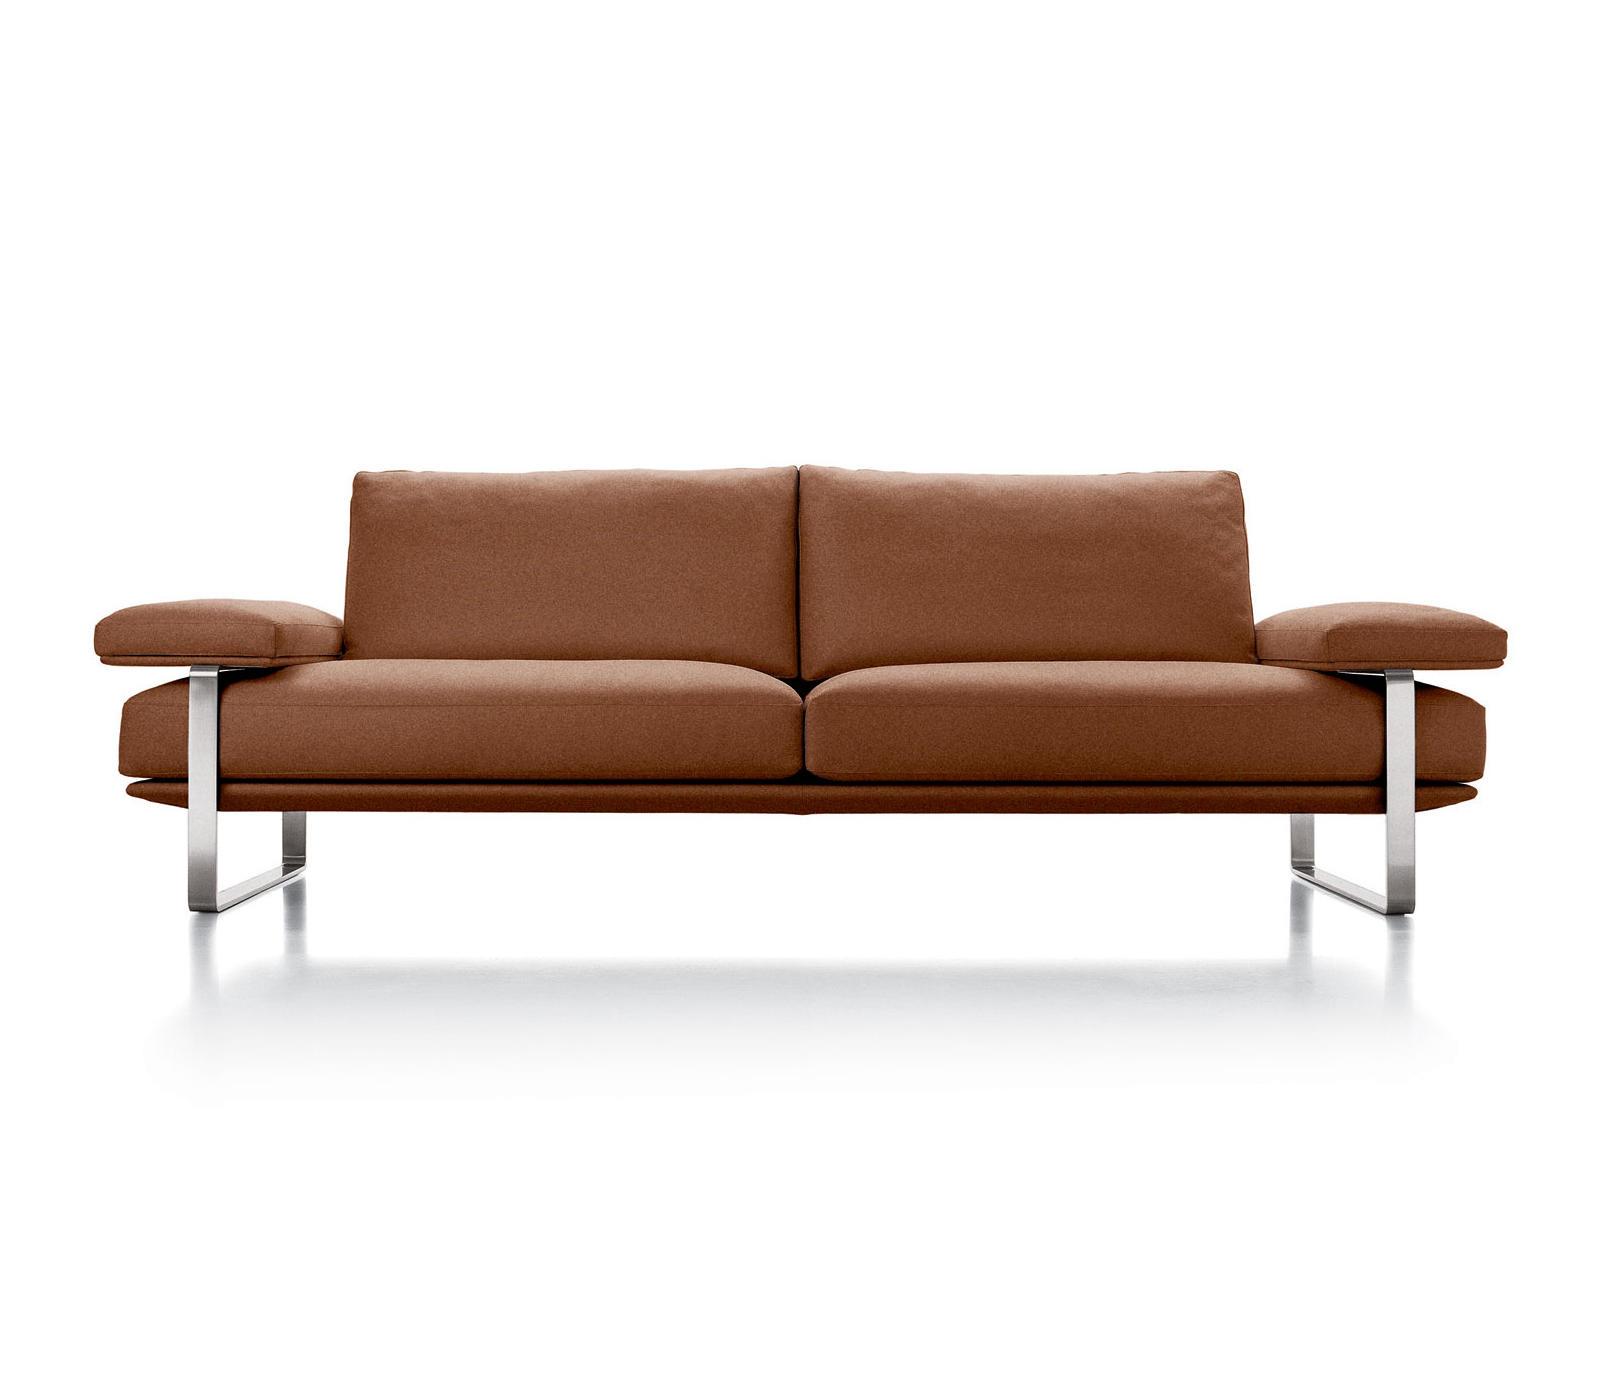 Sofa Blocks Radiator Where Should I Position A Radiator